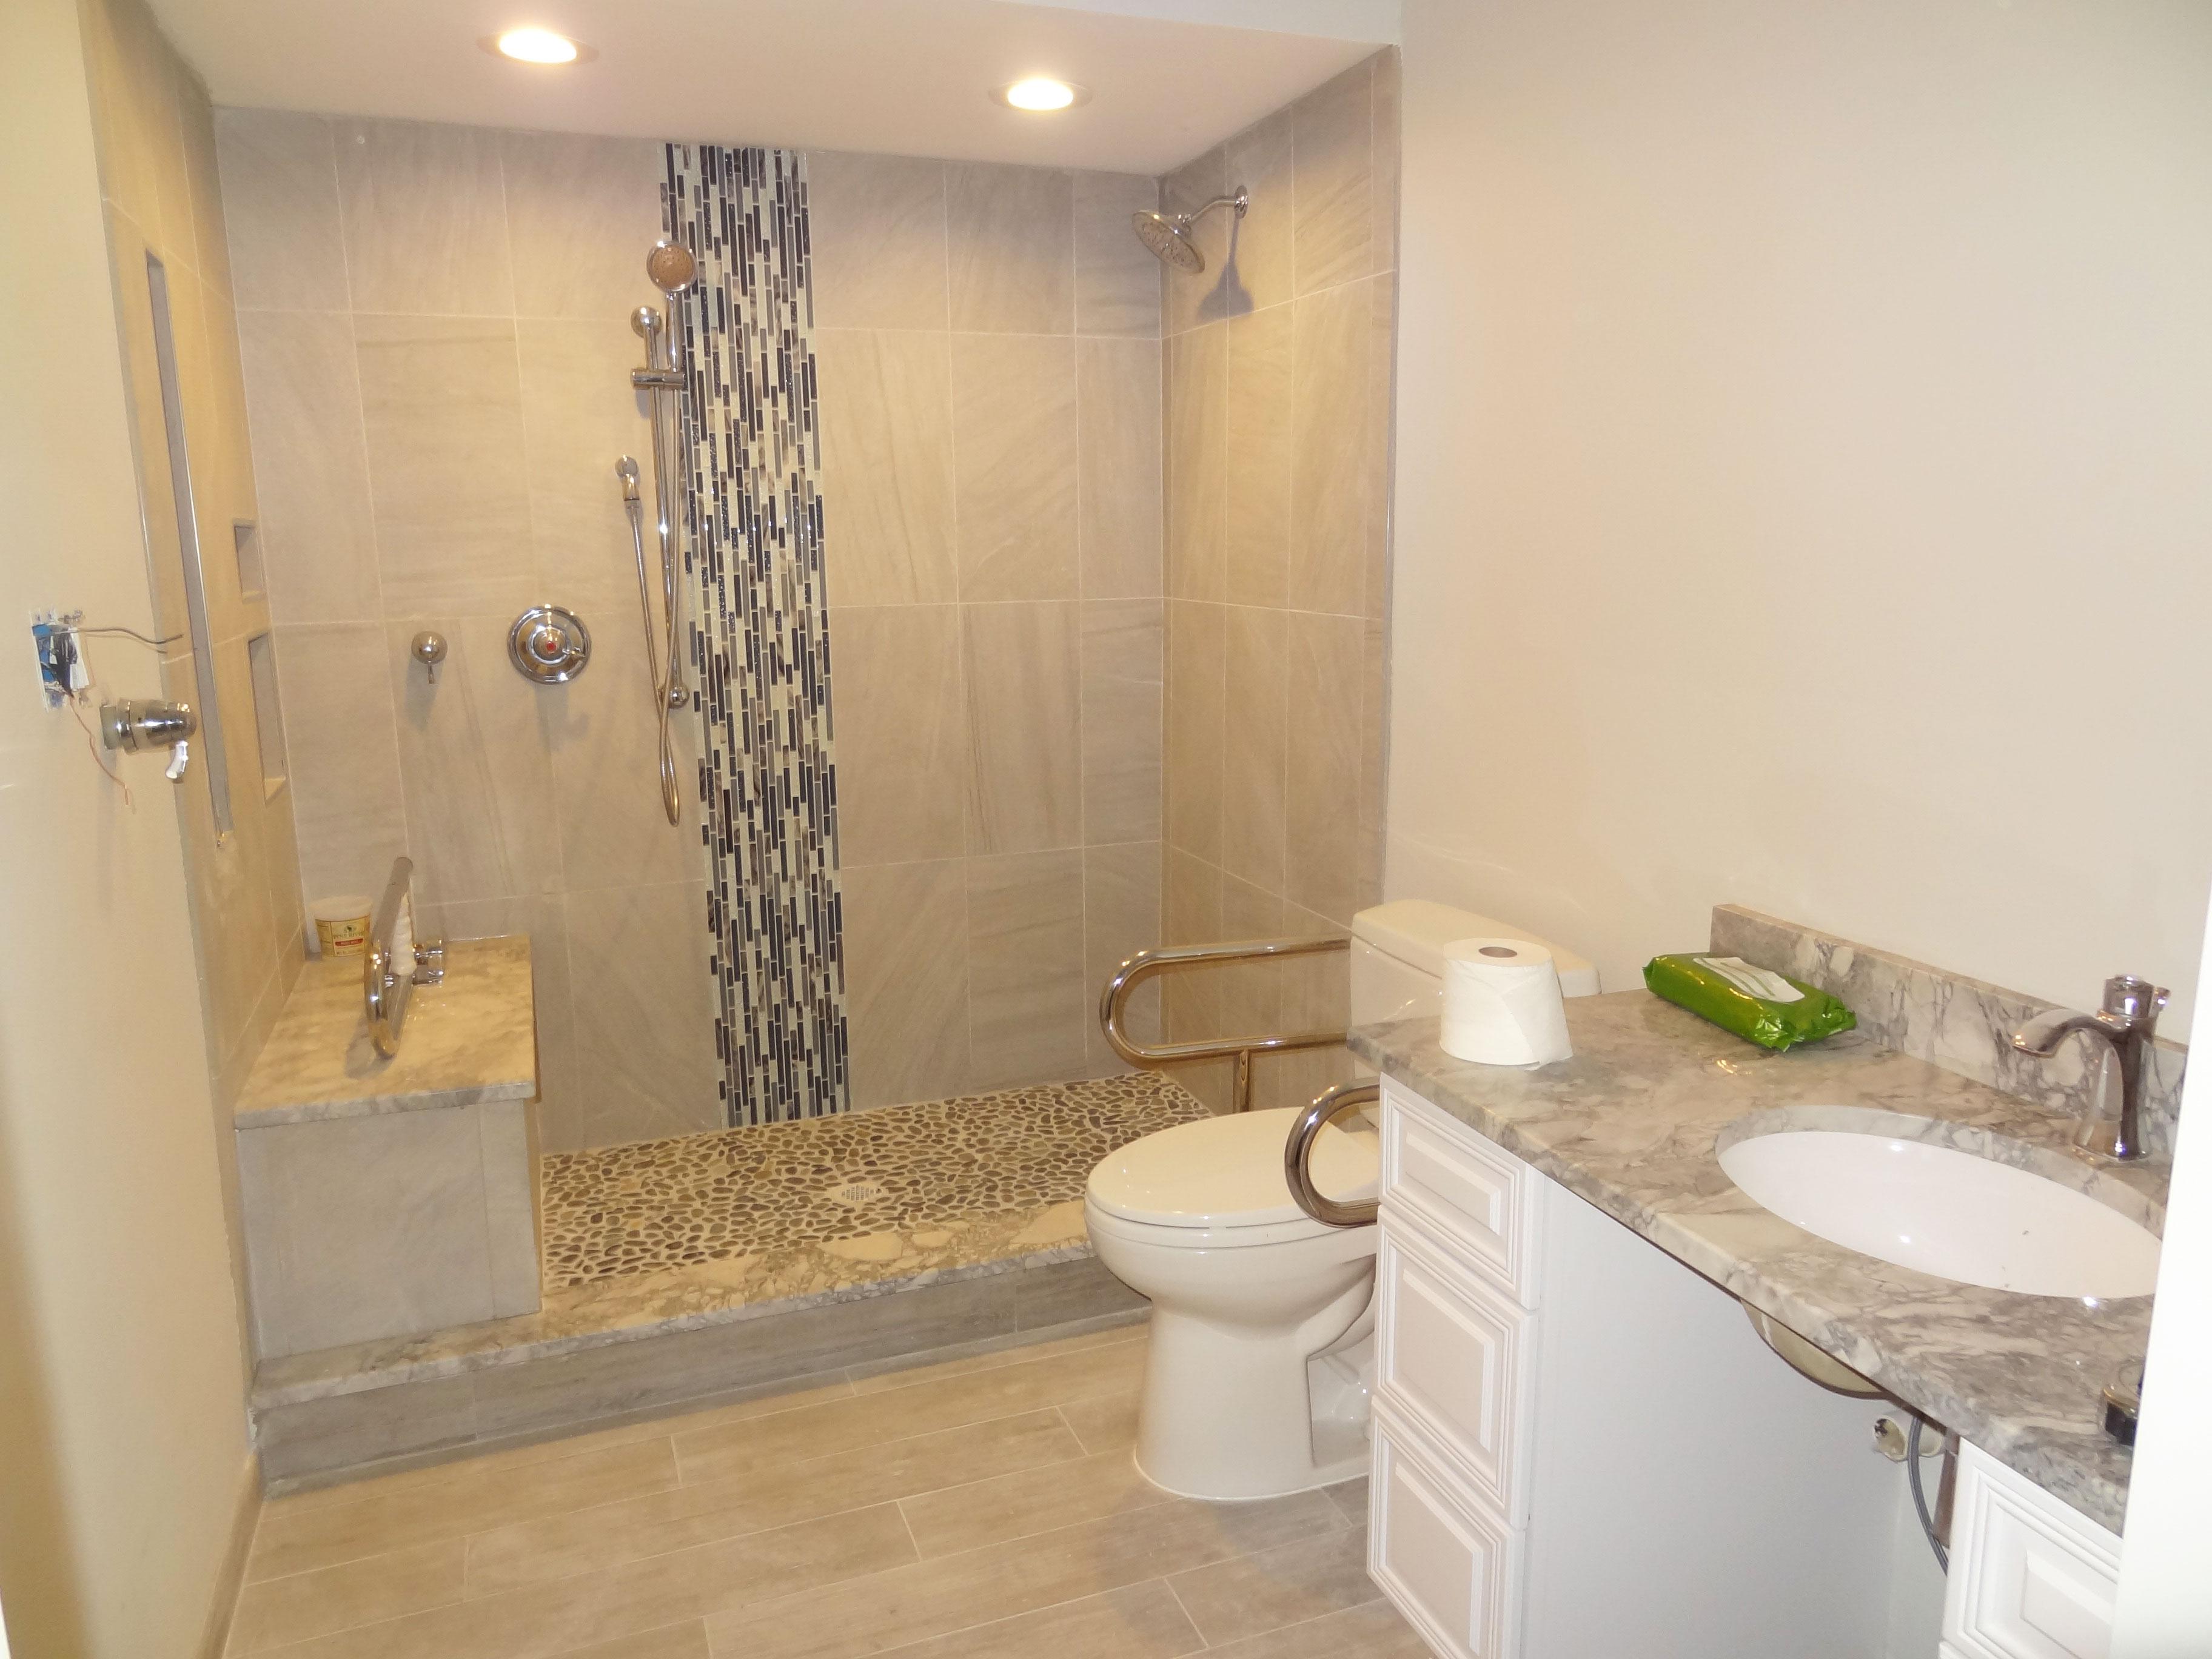 Best Kitchen Gallery: Ohi Design Kitchen Bathroom Remodeling Serving Northern Virginia of Bathroom Remodel Designs  on rachelxblog.com